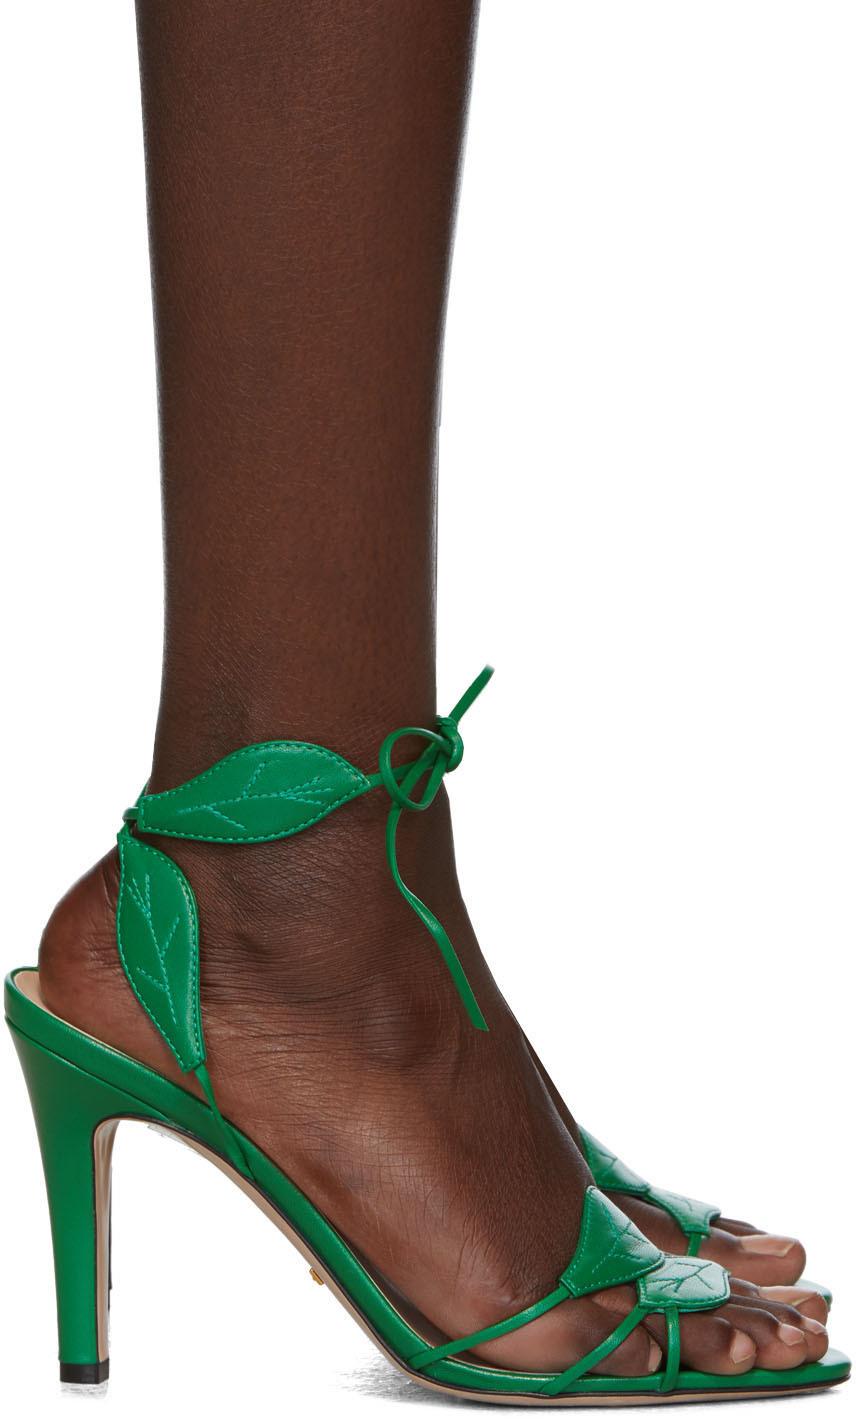 Gucci Green Gianta Leave Heeled Sandals Ssense Heels Green Heels Sandals Heels